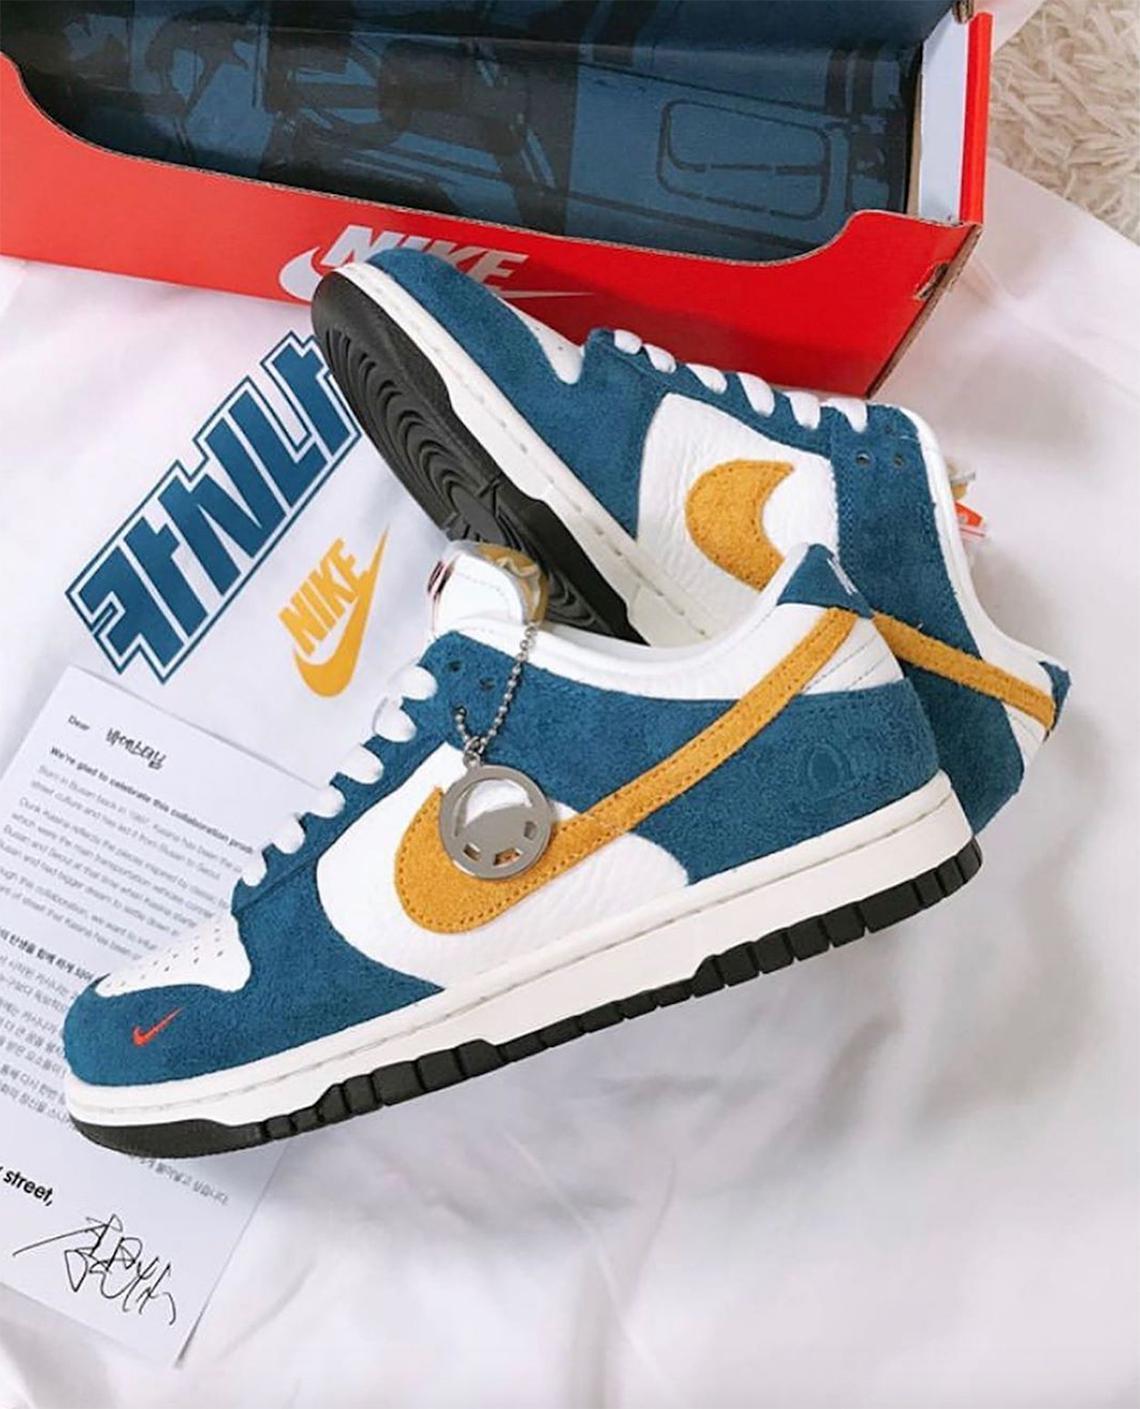 The Kasina x Nike Dunk Low